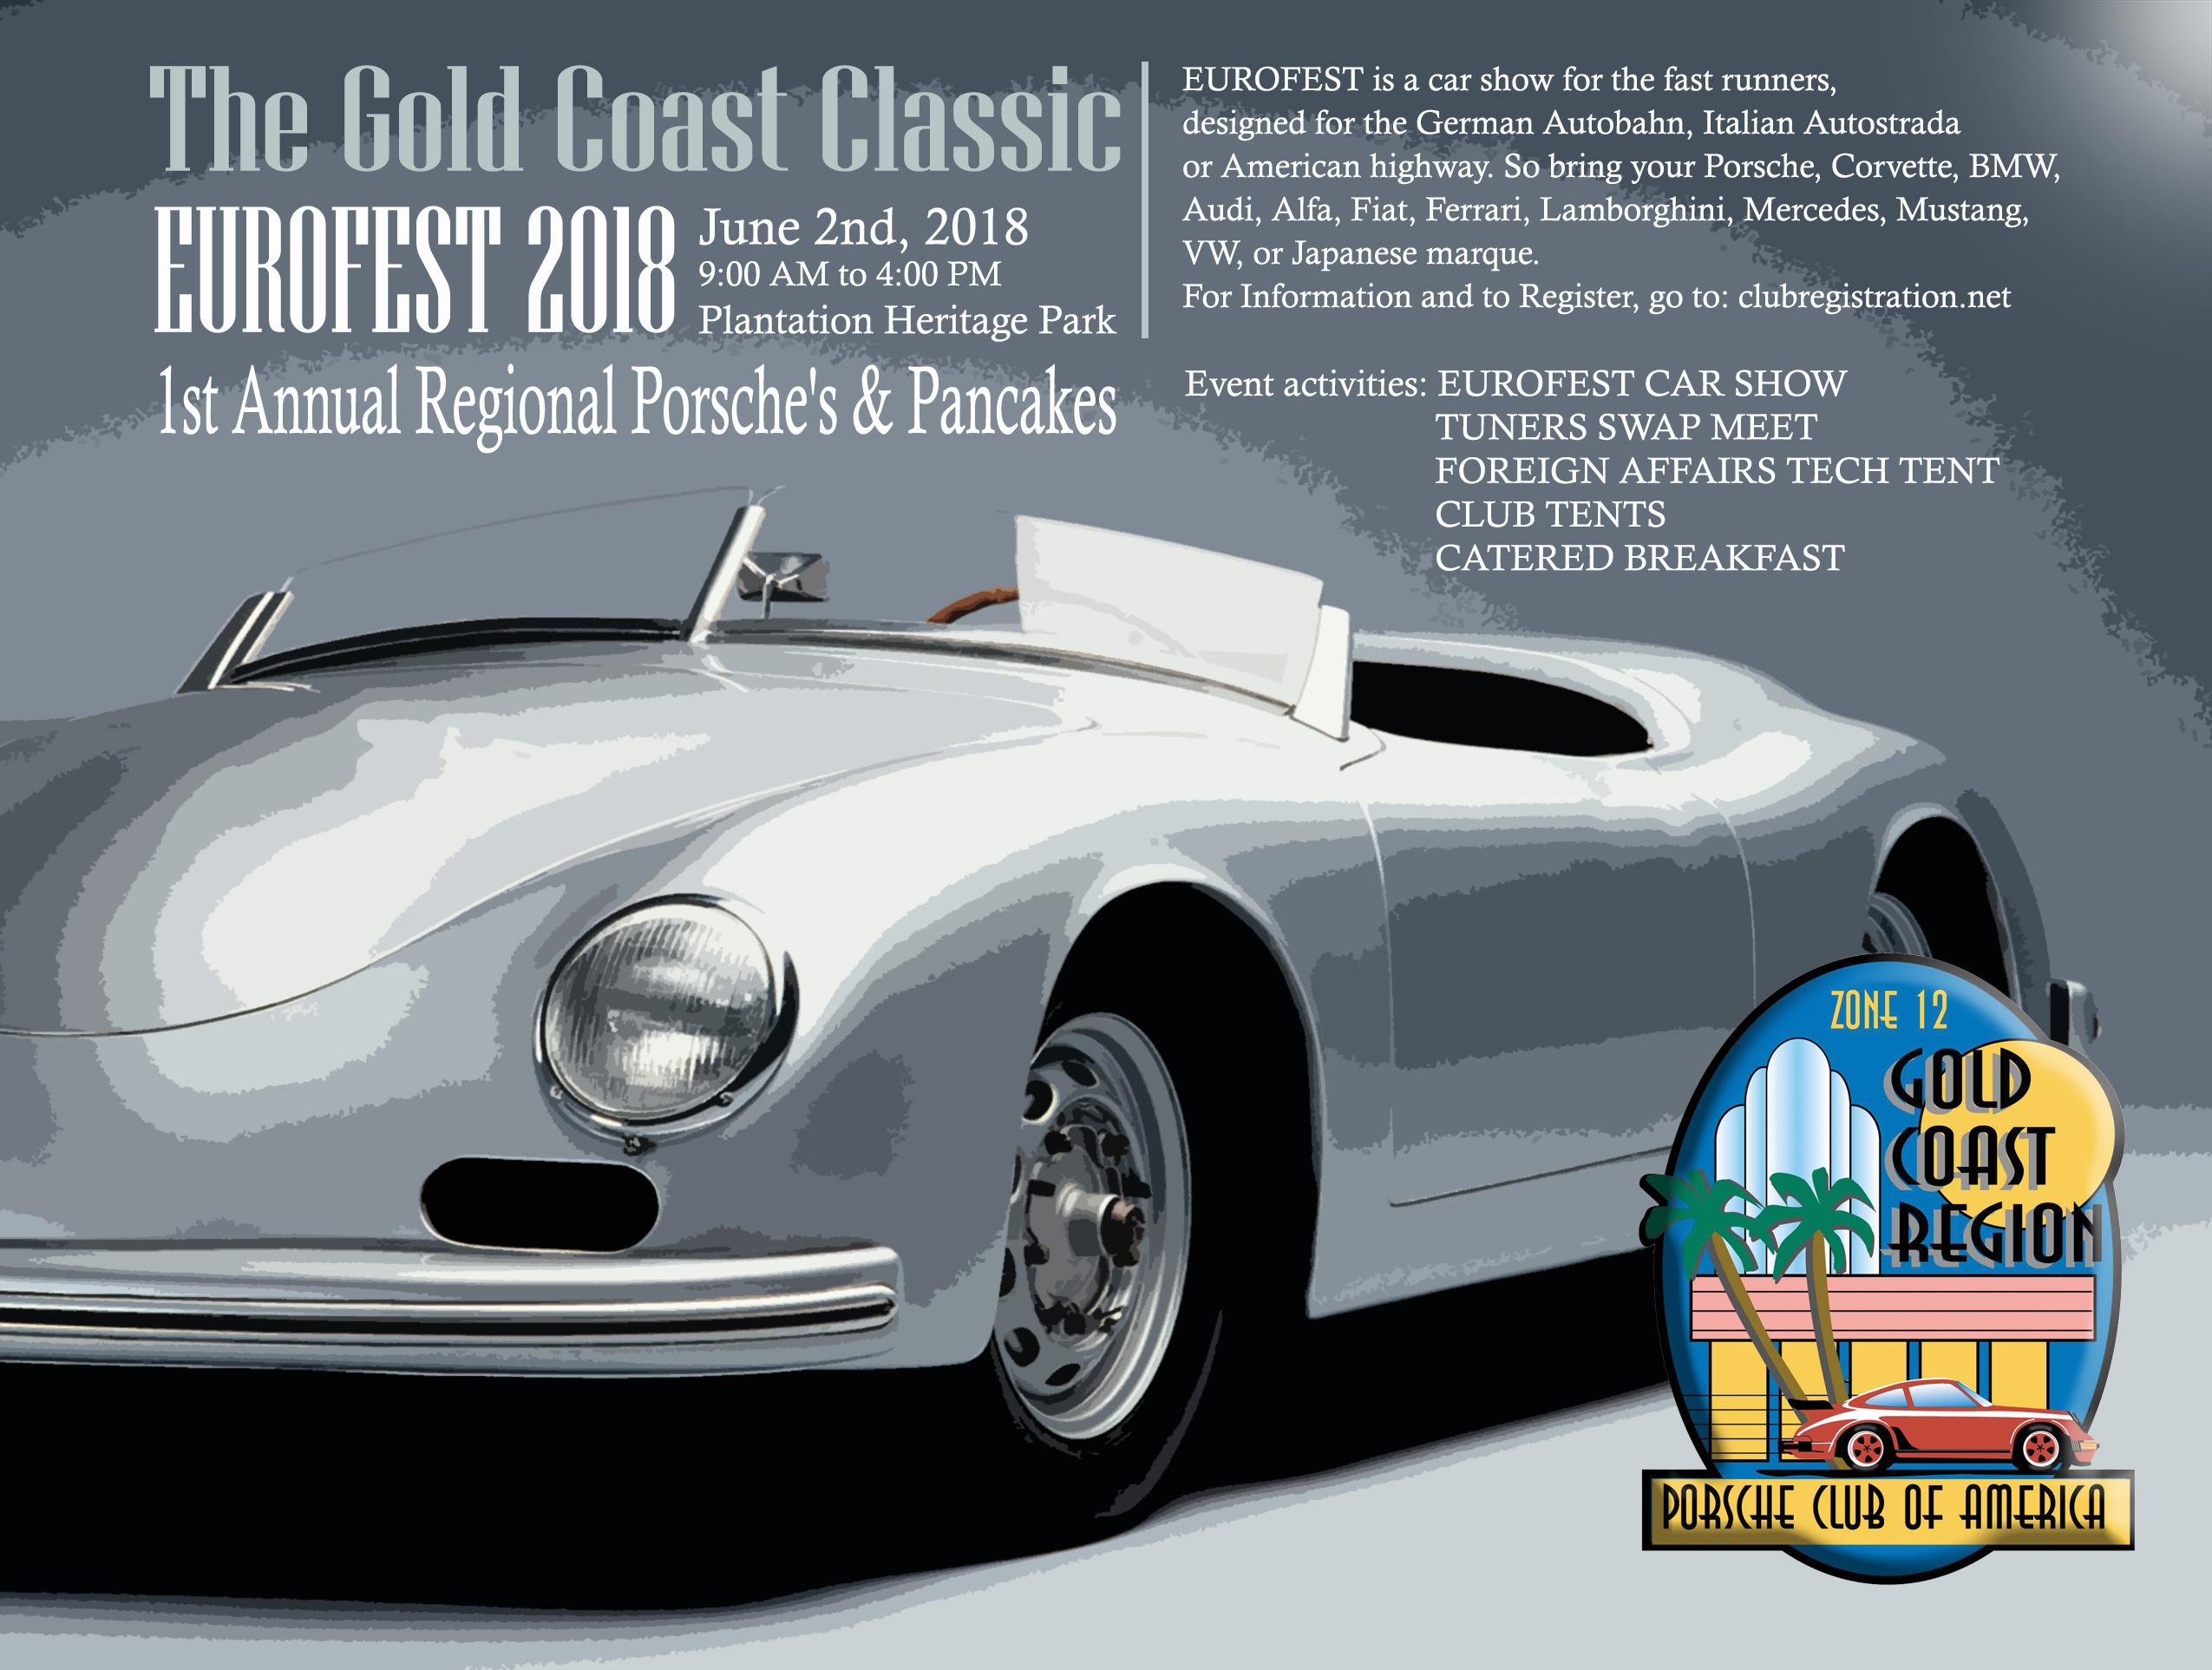 Eurofest Porsches Pancakes Gold Coast Region - American heritage car show